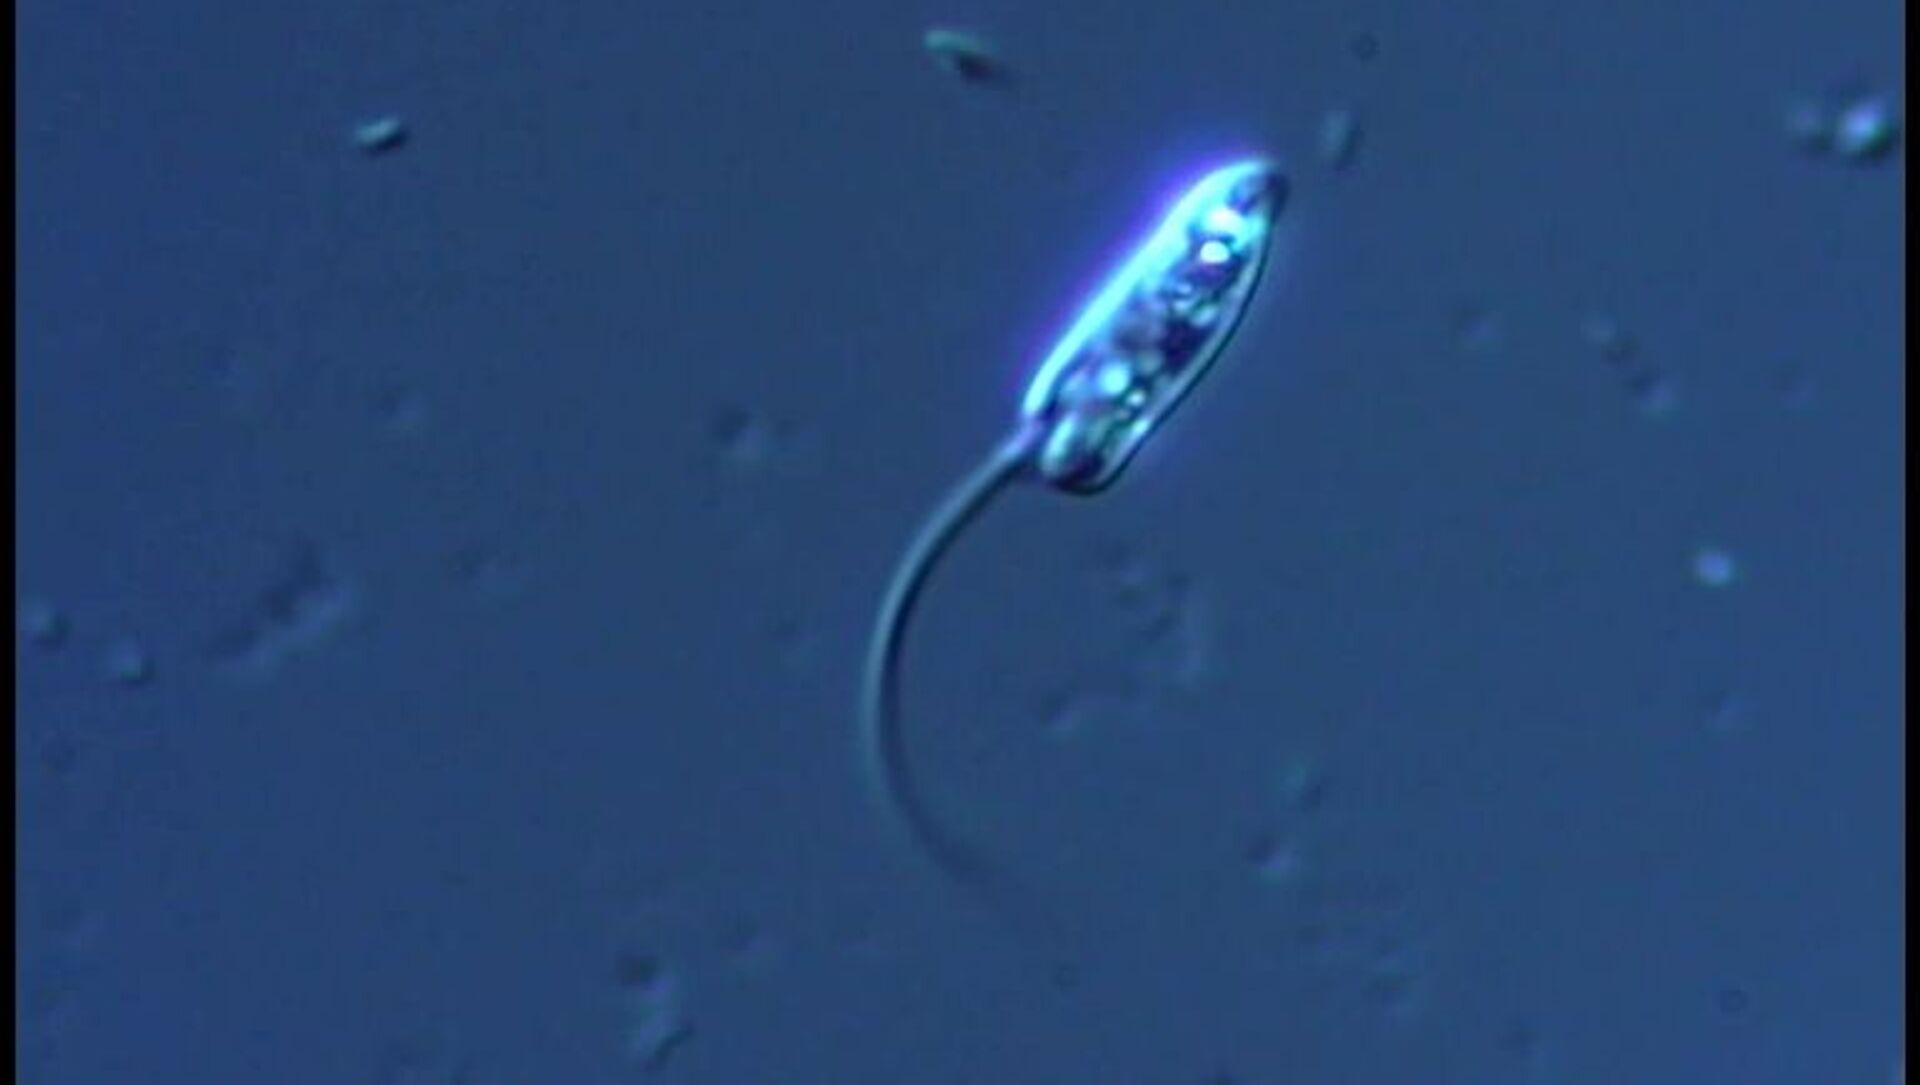 Microbial species - Sputnik International, 1920, 03.08.2021